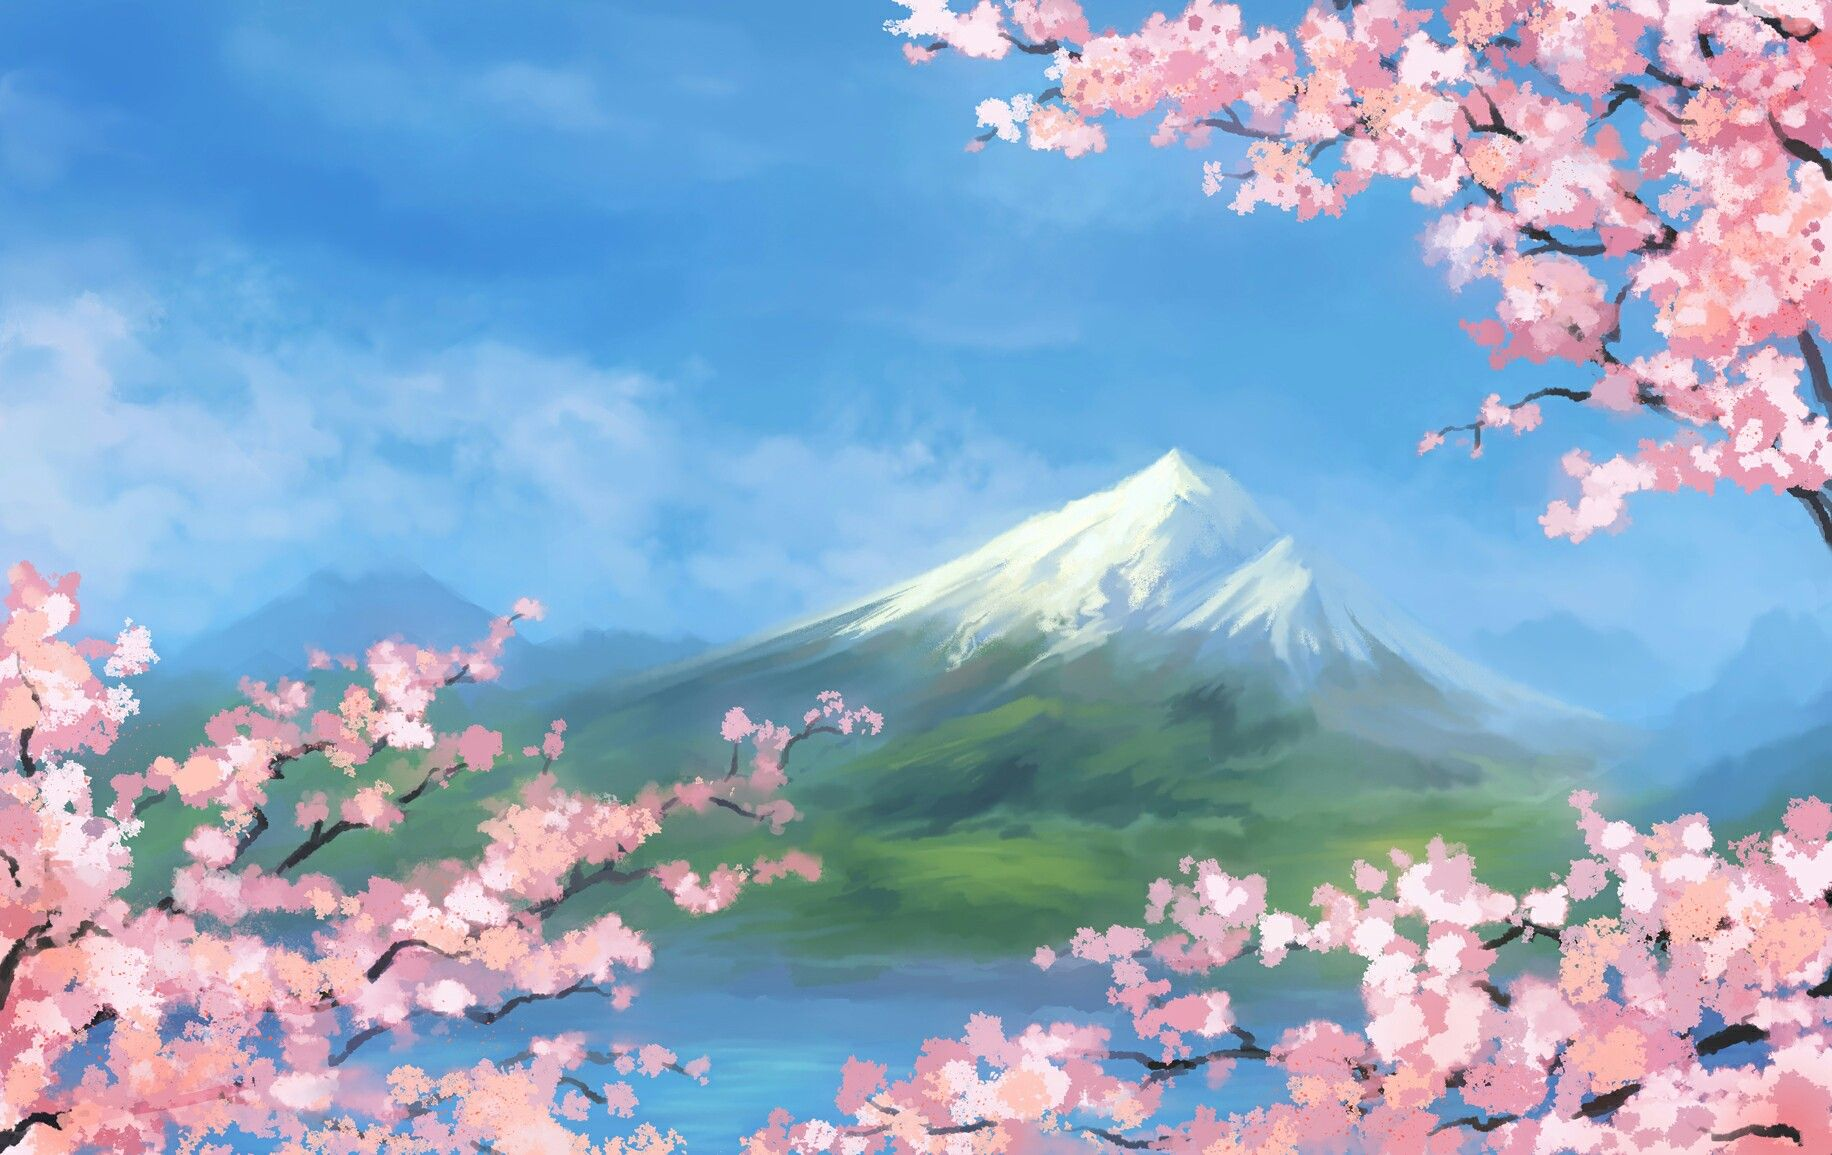 The Nature Of Anime Nature Anime Sky Wallpapers Kawaii View Kurdishotaku Image Art طبيعة خلفيات أ Nature Art Anime Art Beautiful Anime Wallpaper